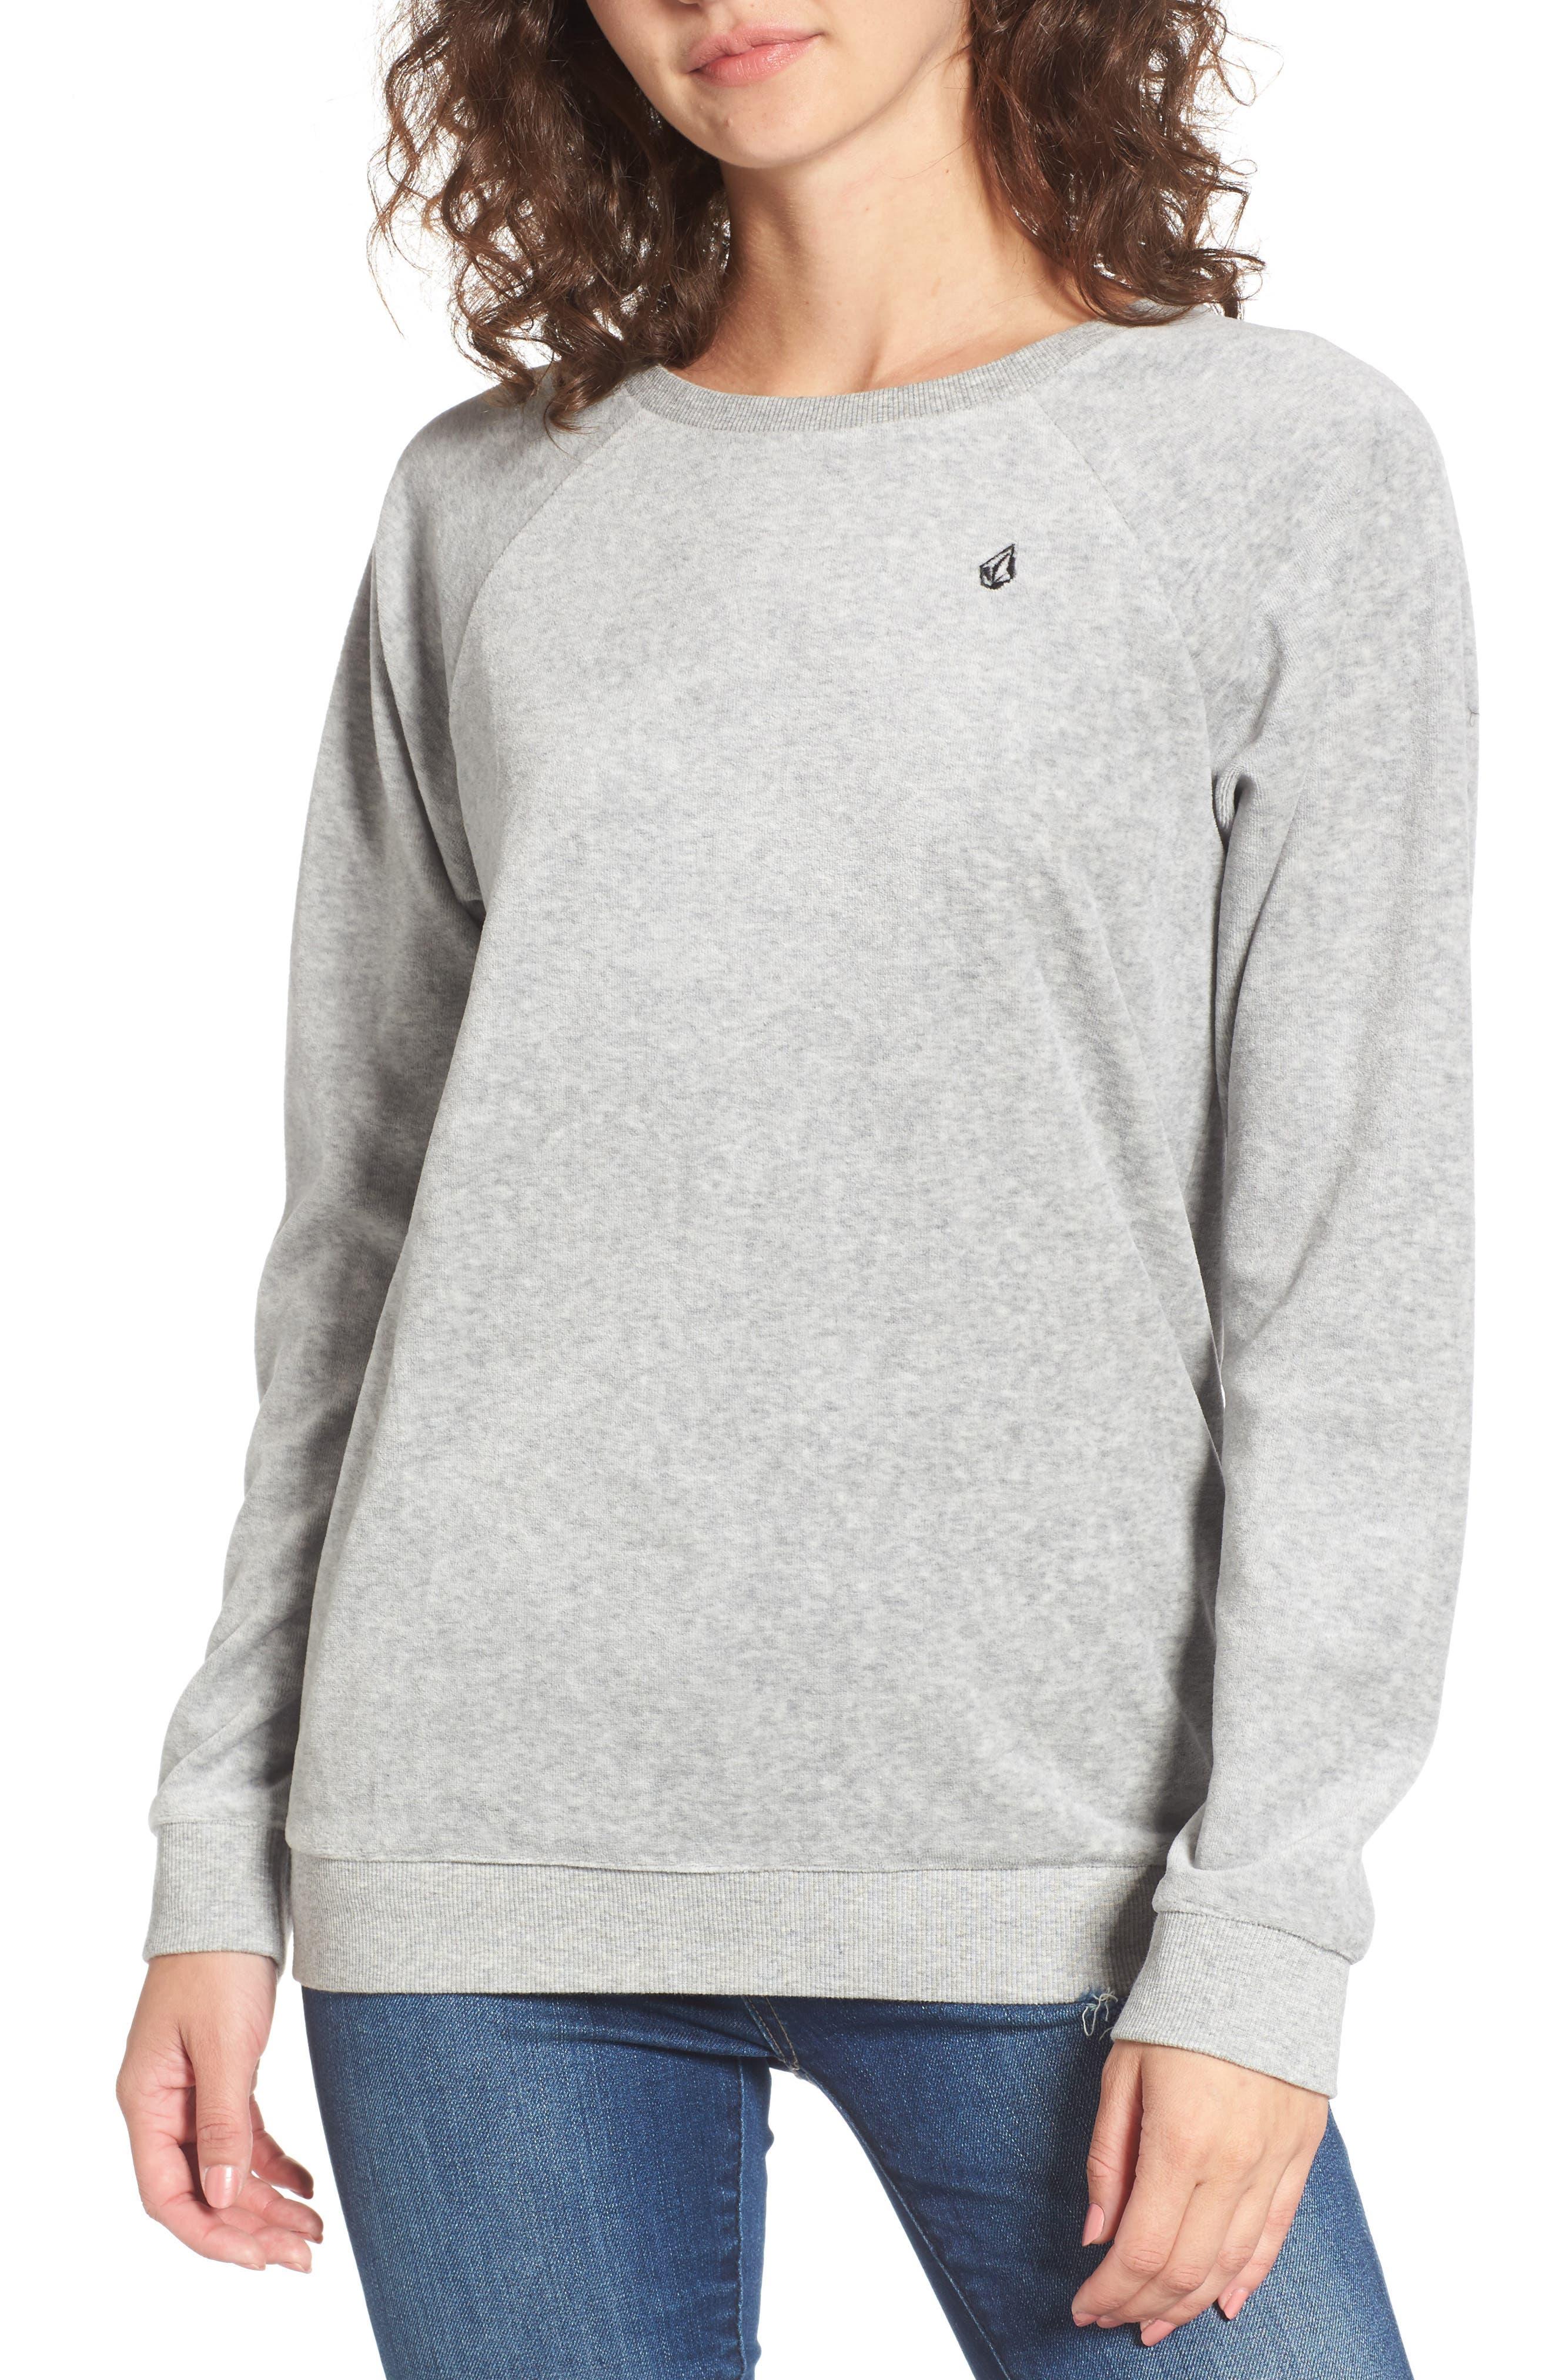 Gotta Crush Raglan Sweatshirt,                             Main thumbnail 1, color,                             035